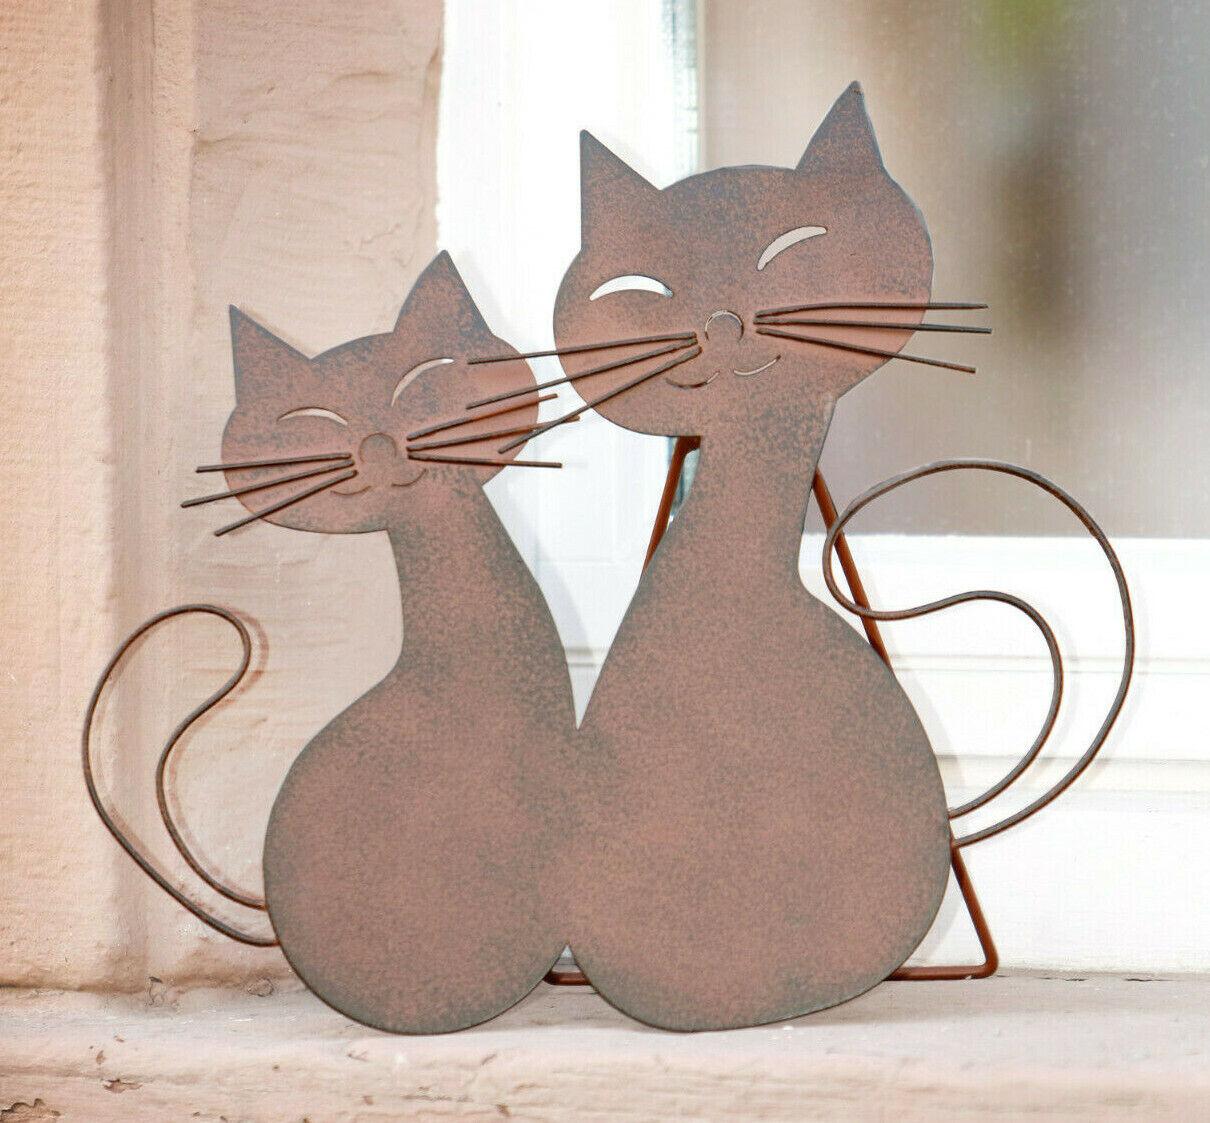 Metall Deko Katzenpaar, Gartenstecker, Rostoptik, Schimmerkatze mit Ständer